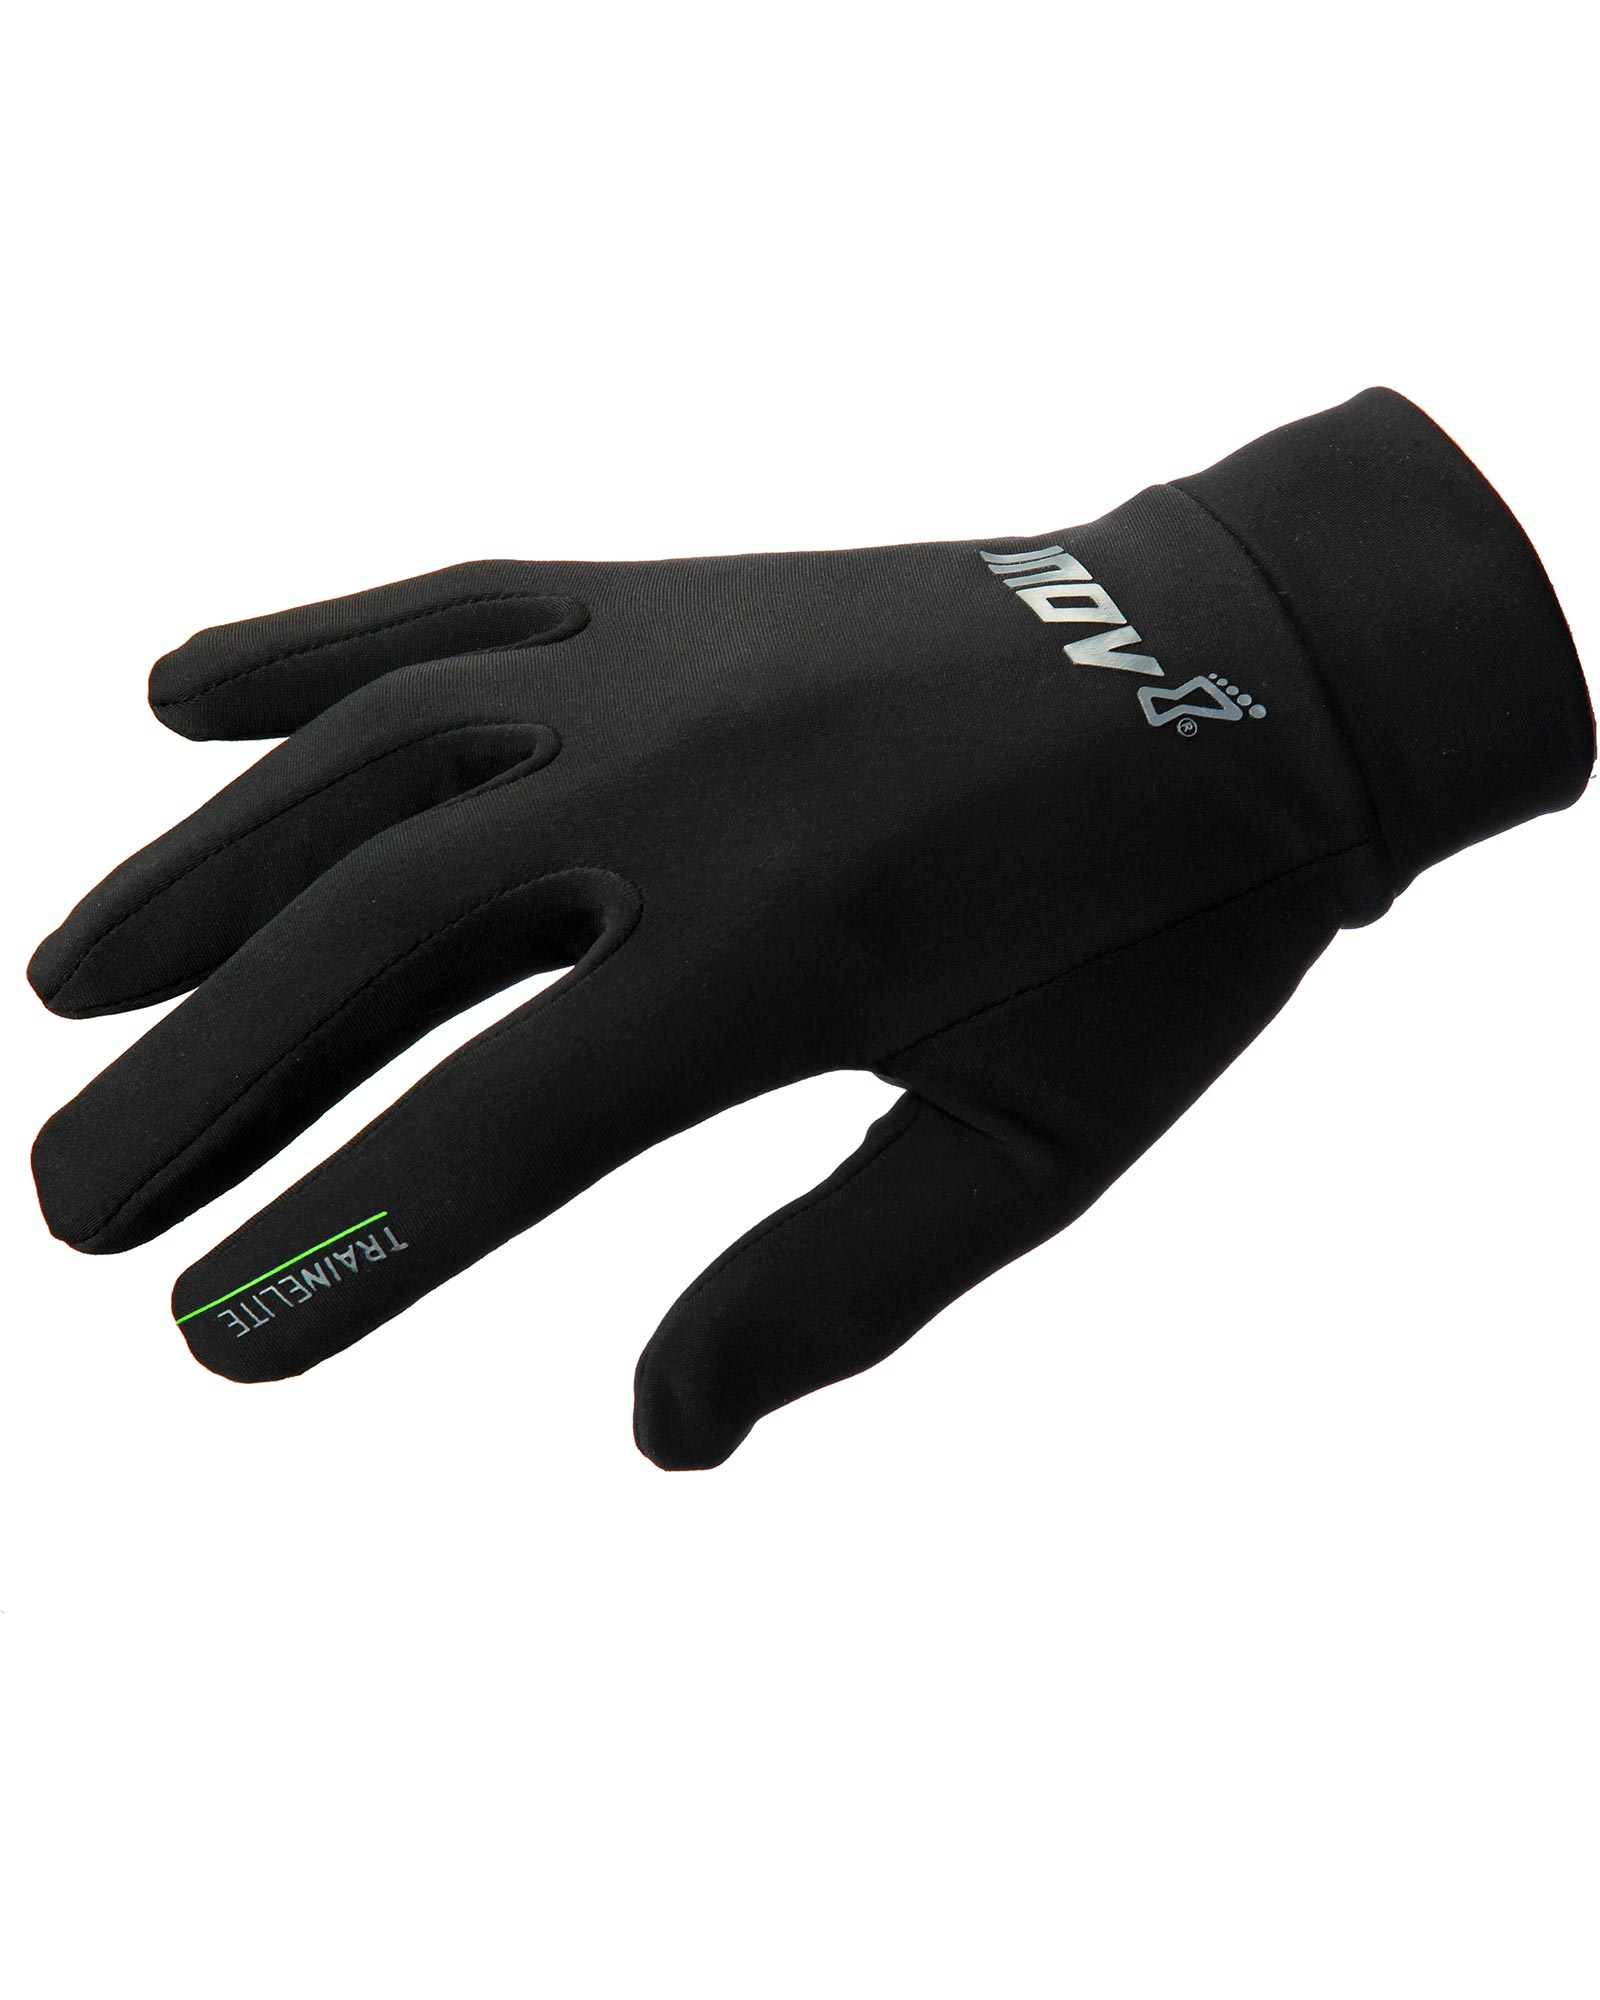 Inov-8 Train Elite Gloves 0